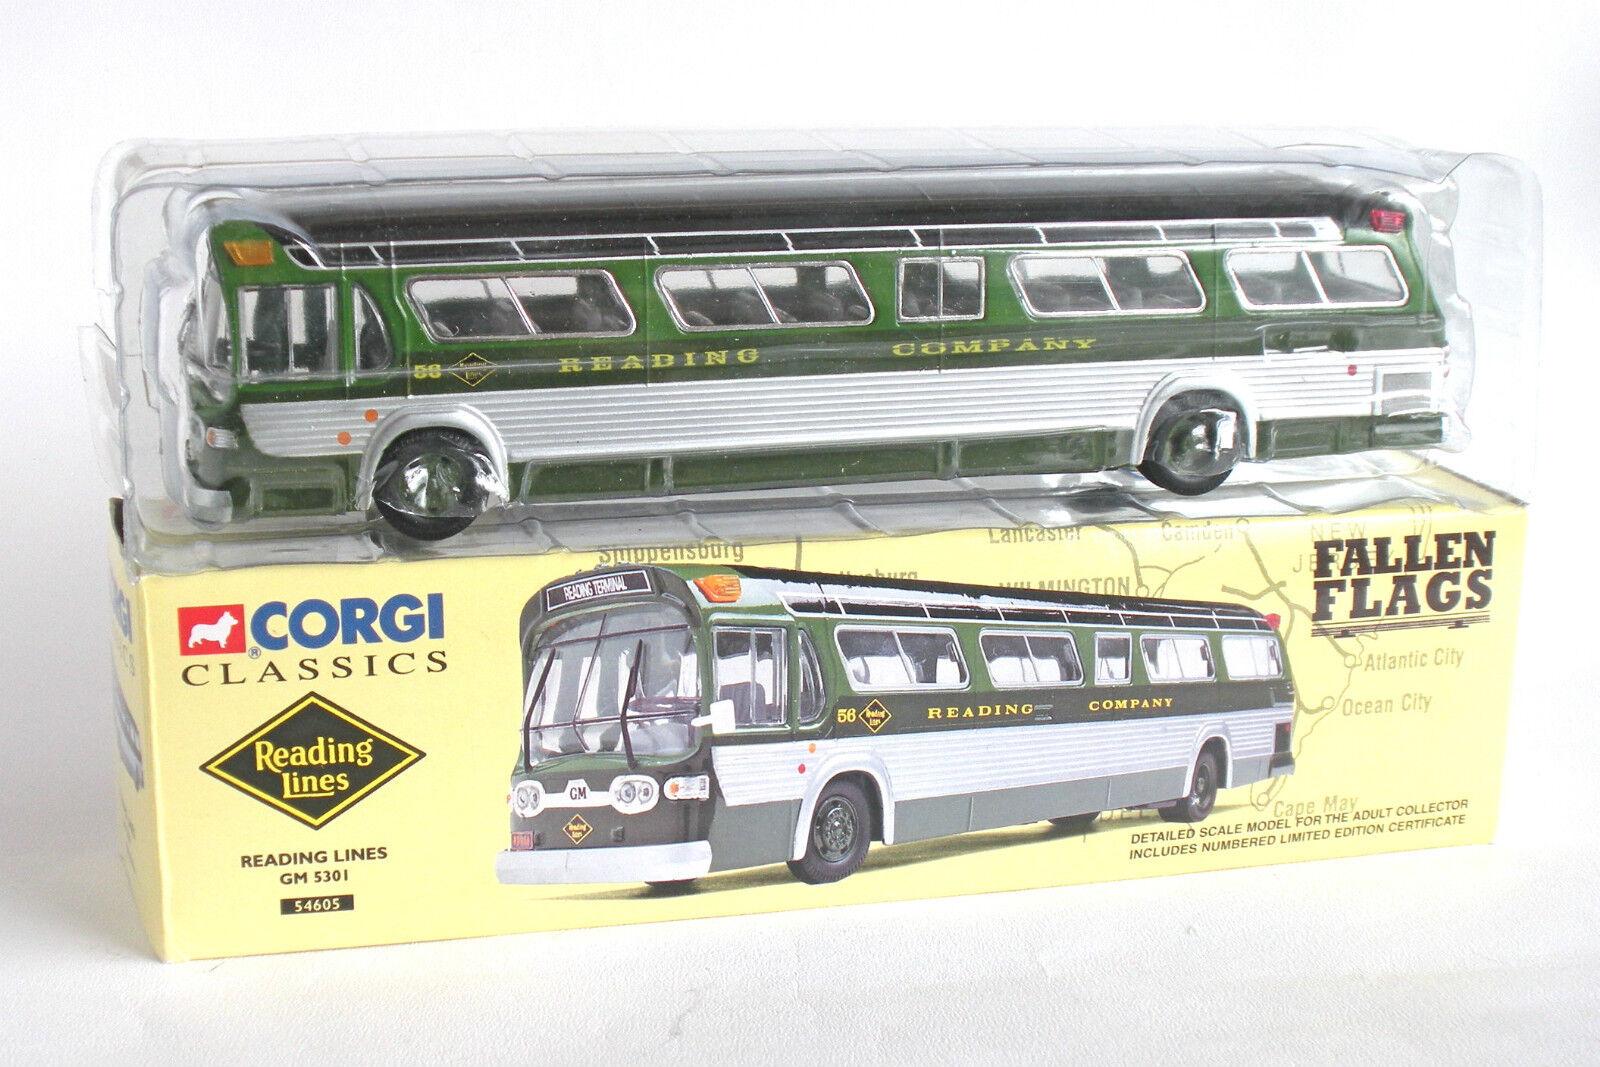 CORGI CLASSICS 54605 READING LINES FISHBOWL GM 5301 - New Boxed